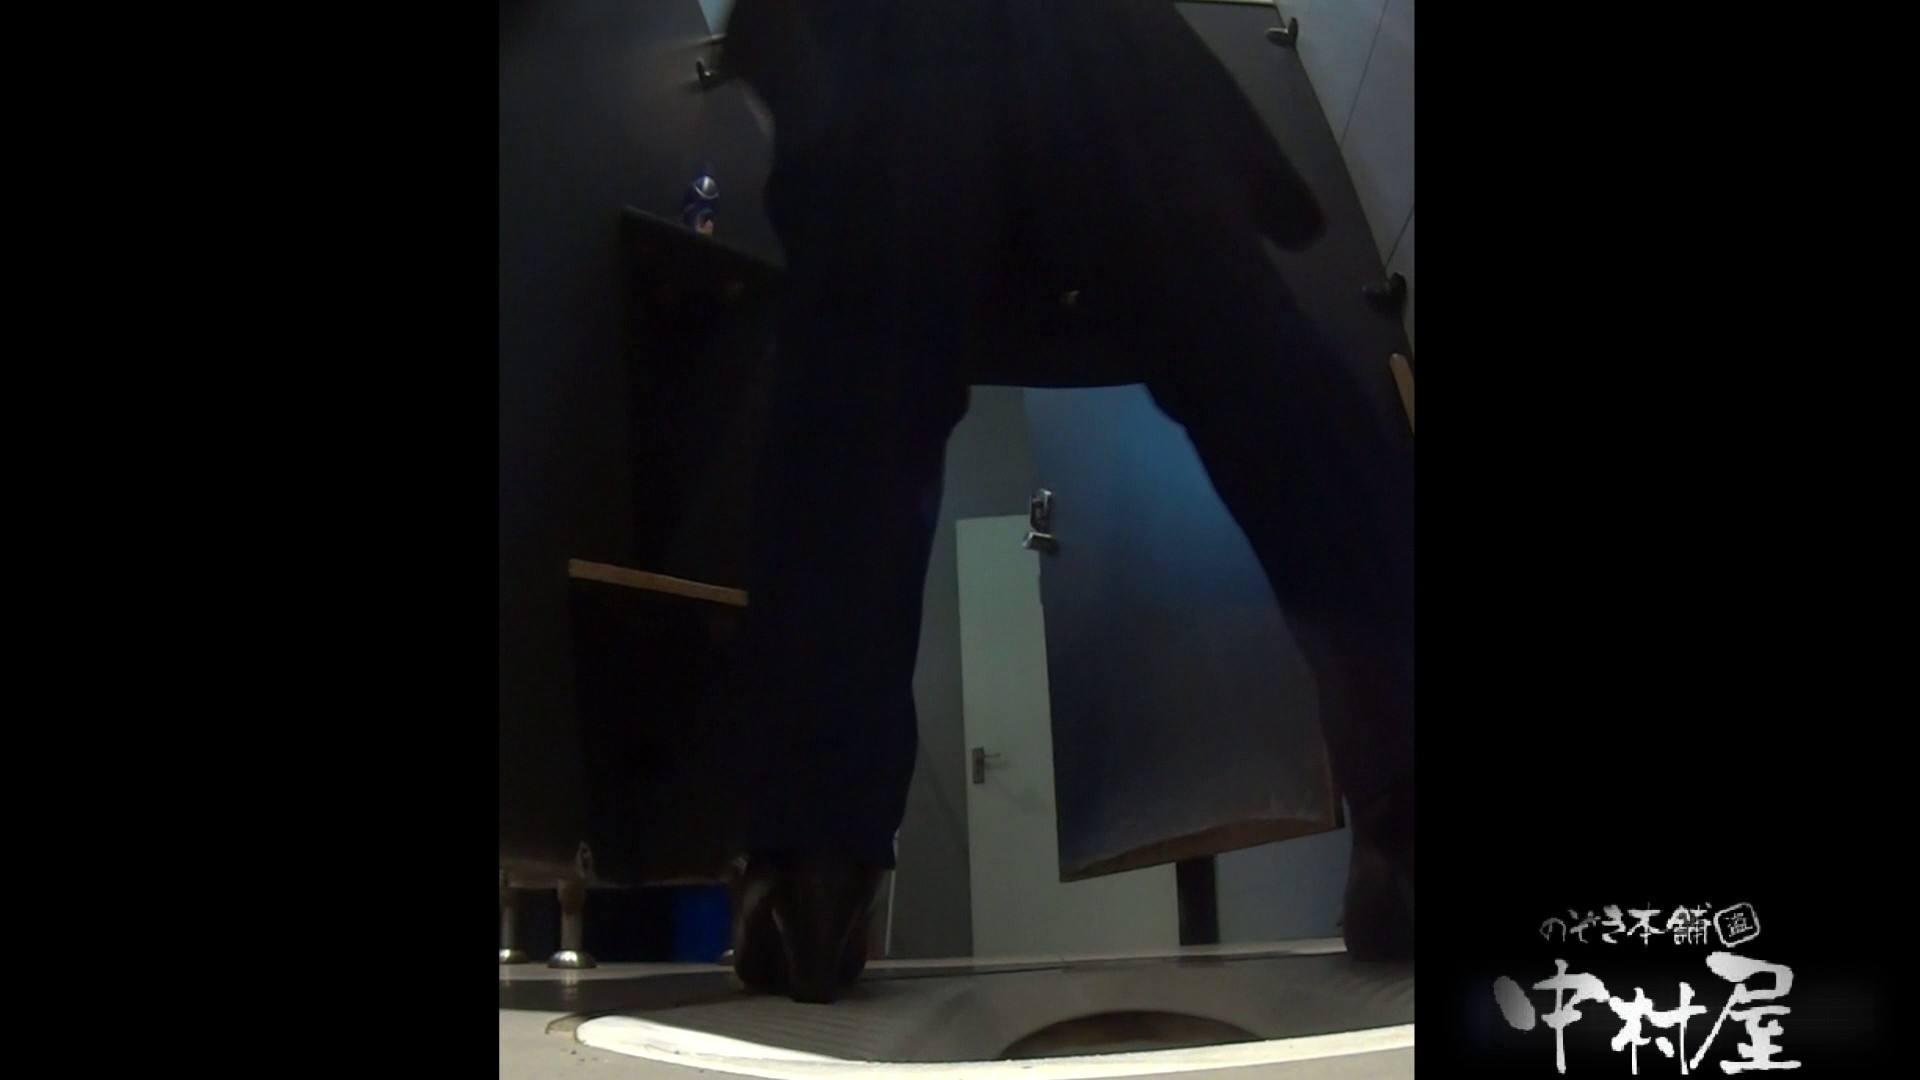 大学休憩時間の洗面所事情22 美女ハメ撮り  81Pix 16